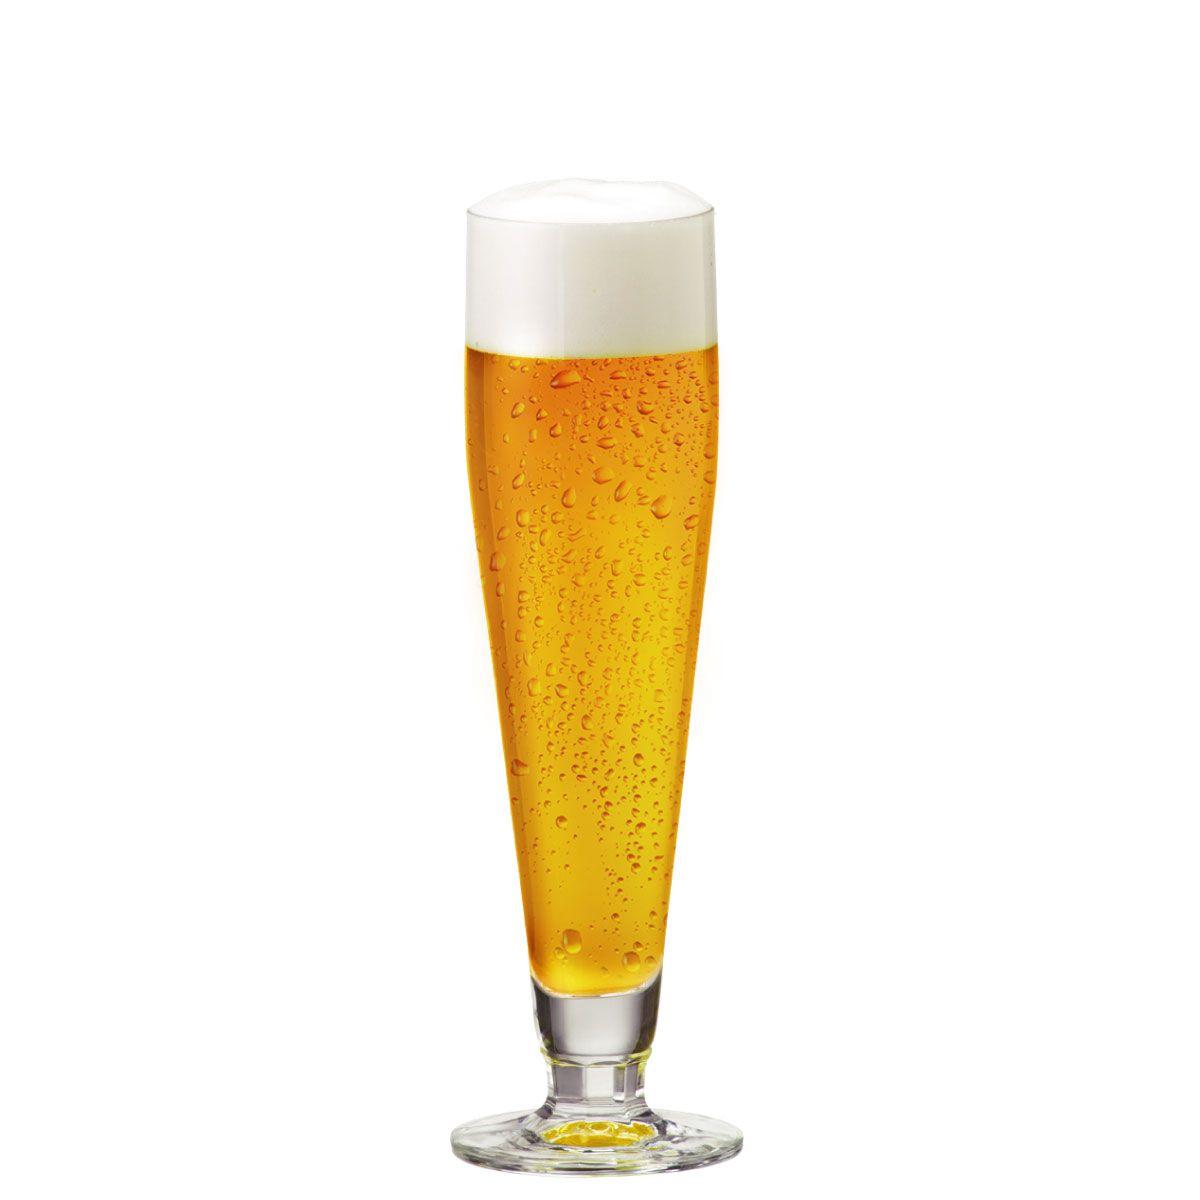 Taça Cerveja - Halle 385ml Cristal